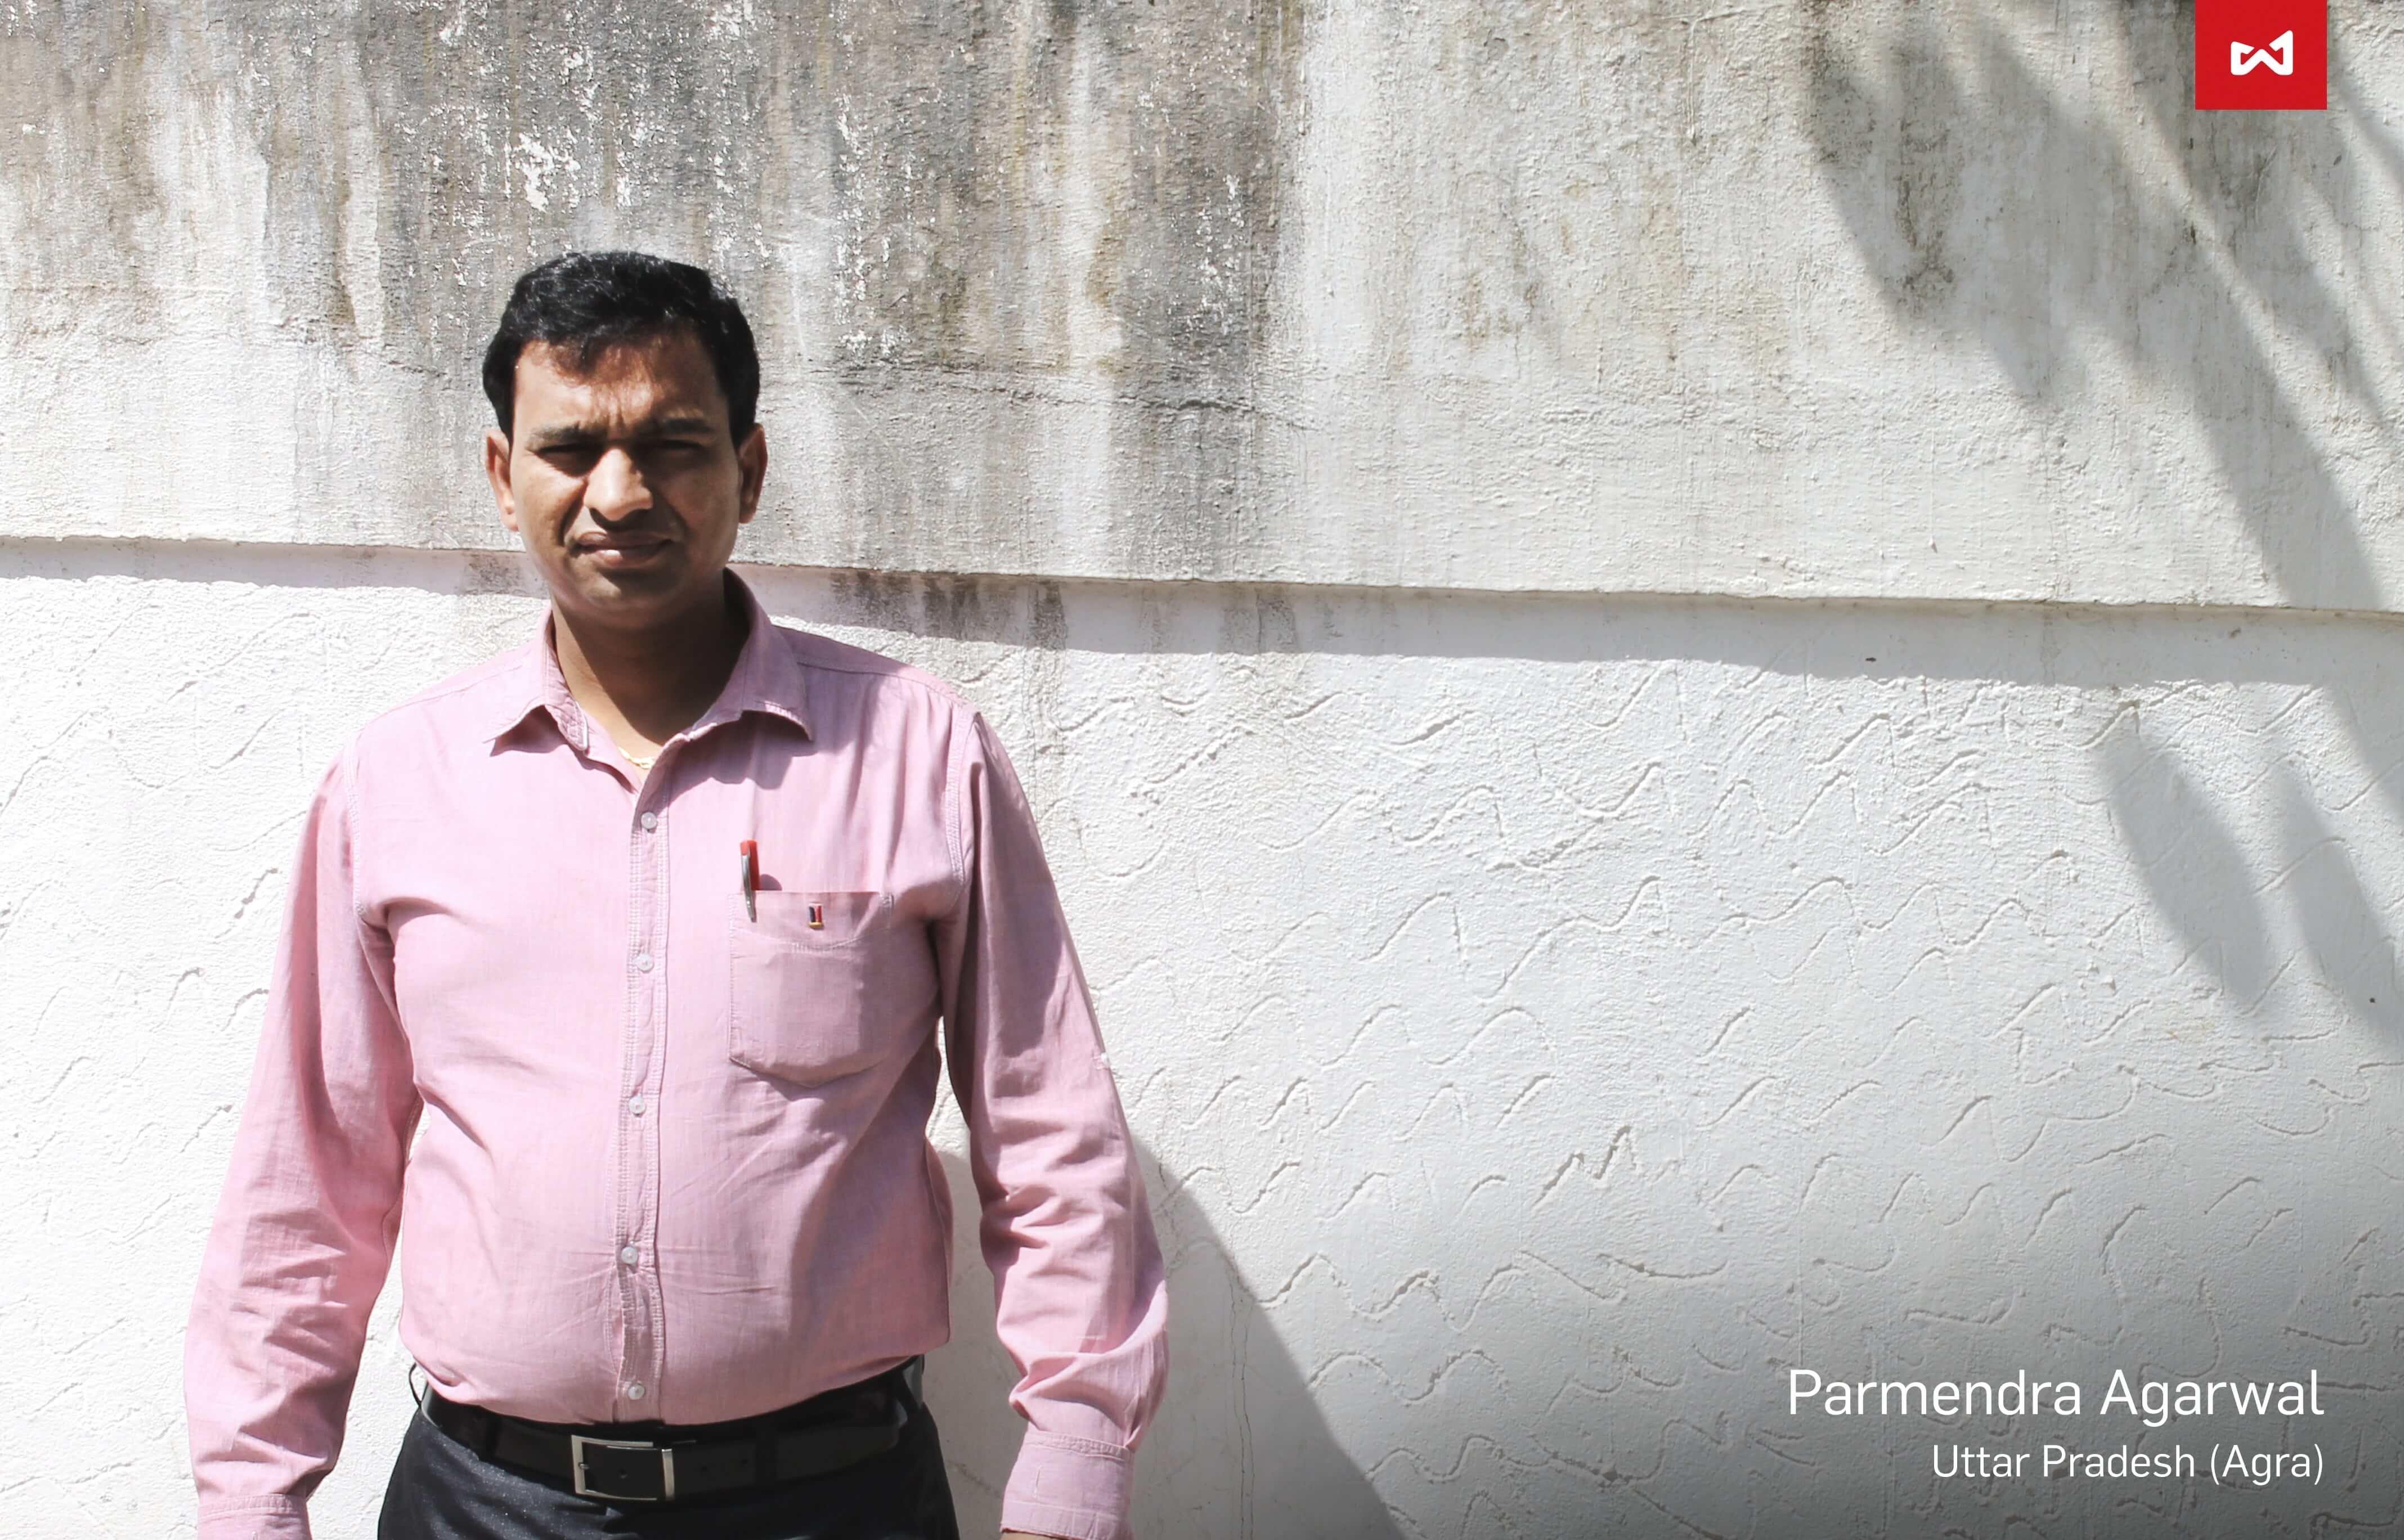 Parmendra Agarwal